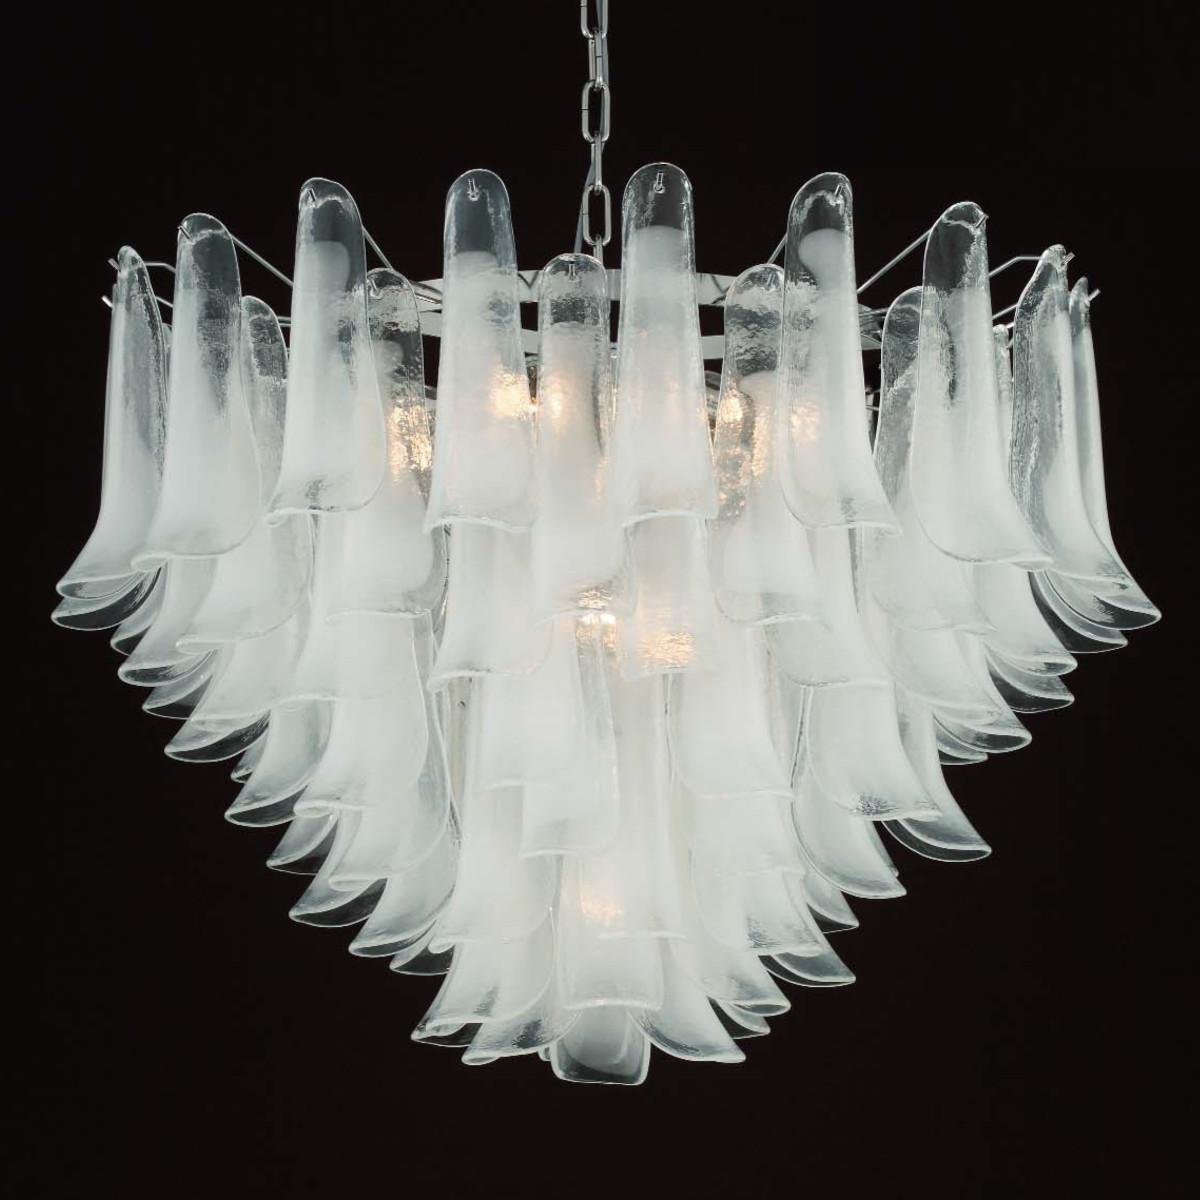 """Calypso"" lampara de cristal de Murano - 13 luces - blanco"